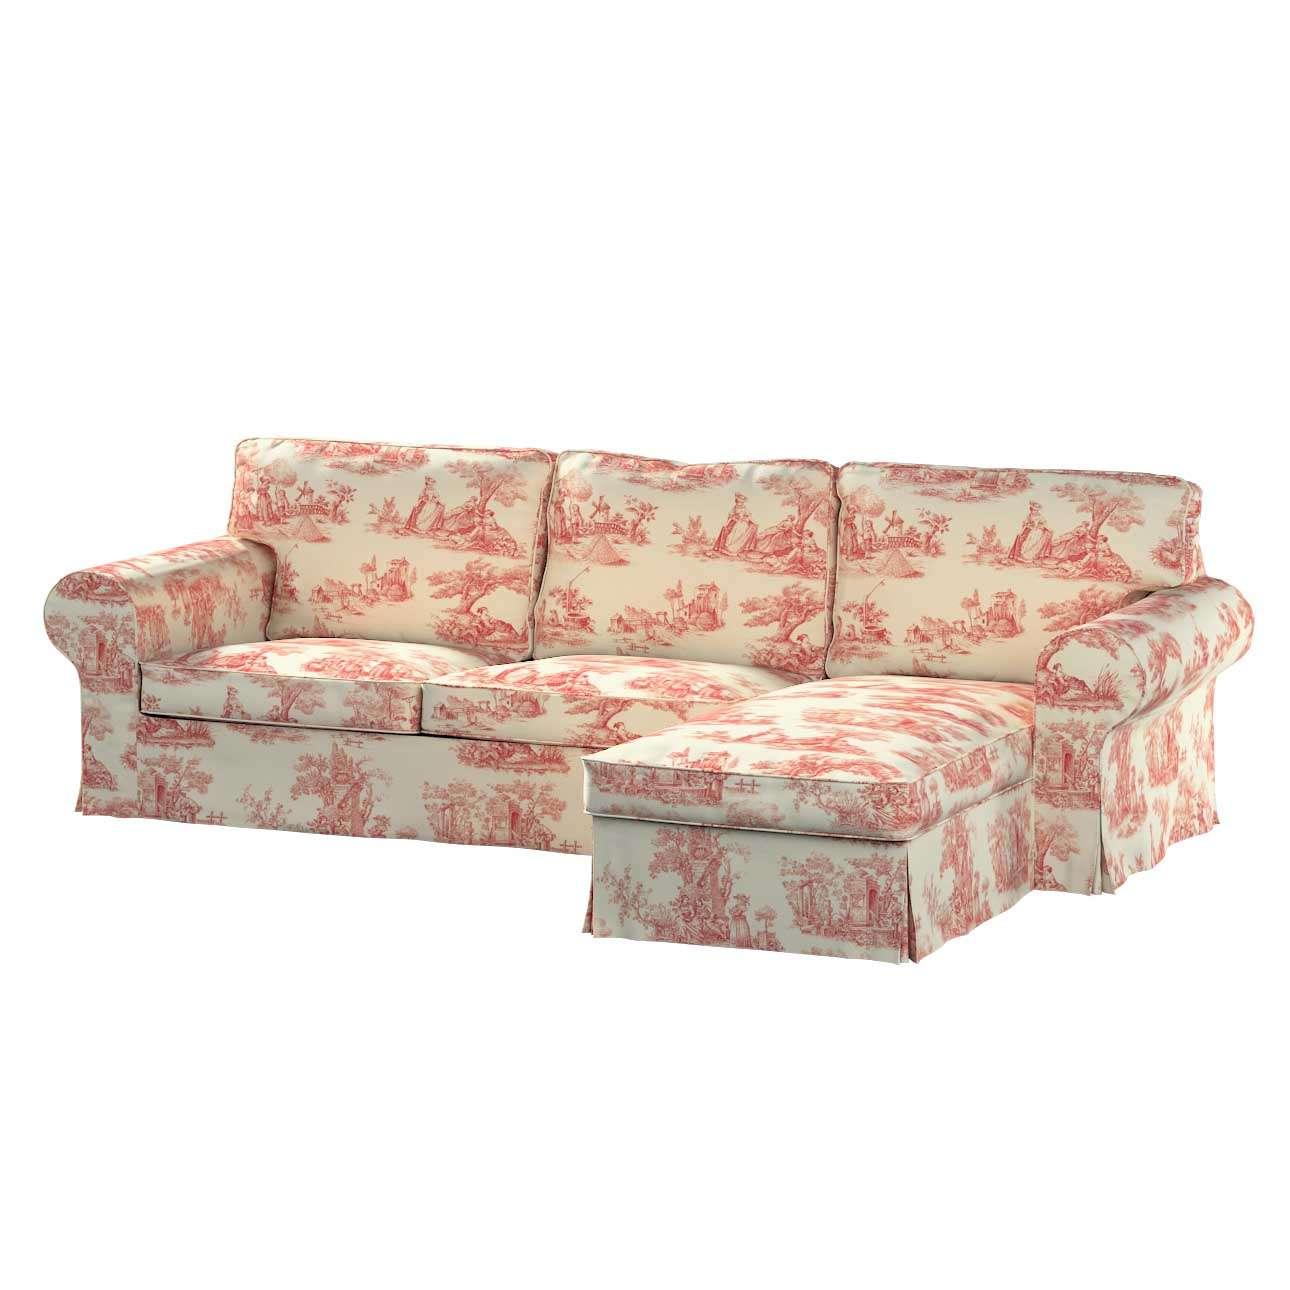 Ektorp 2-Sitzer Sofabezug mit Recamiere Ektorp 2-Sitzer Sofabezug mit Recamiere von der Kollektion Avinon, Stoff: 132-15